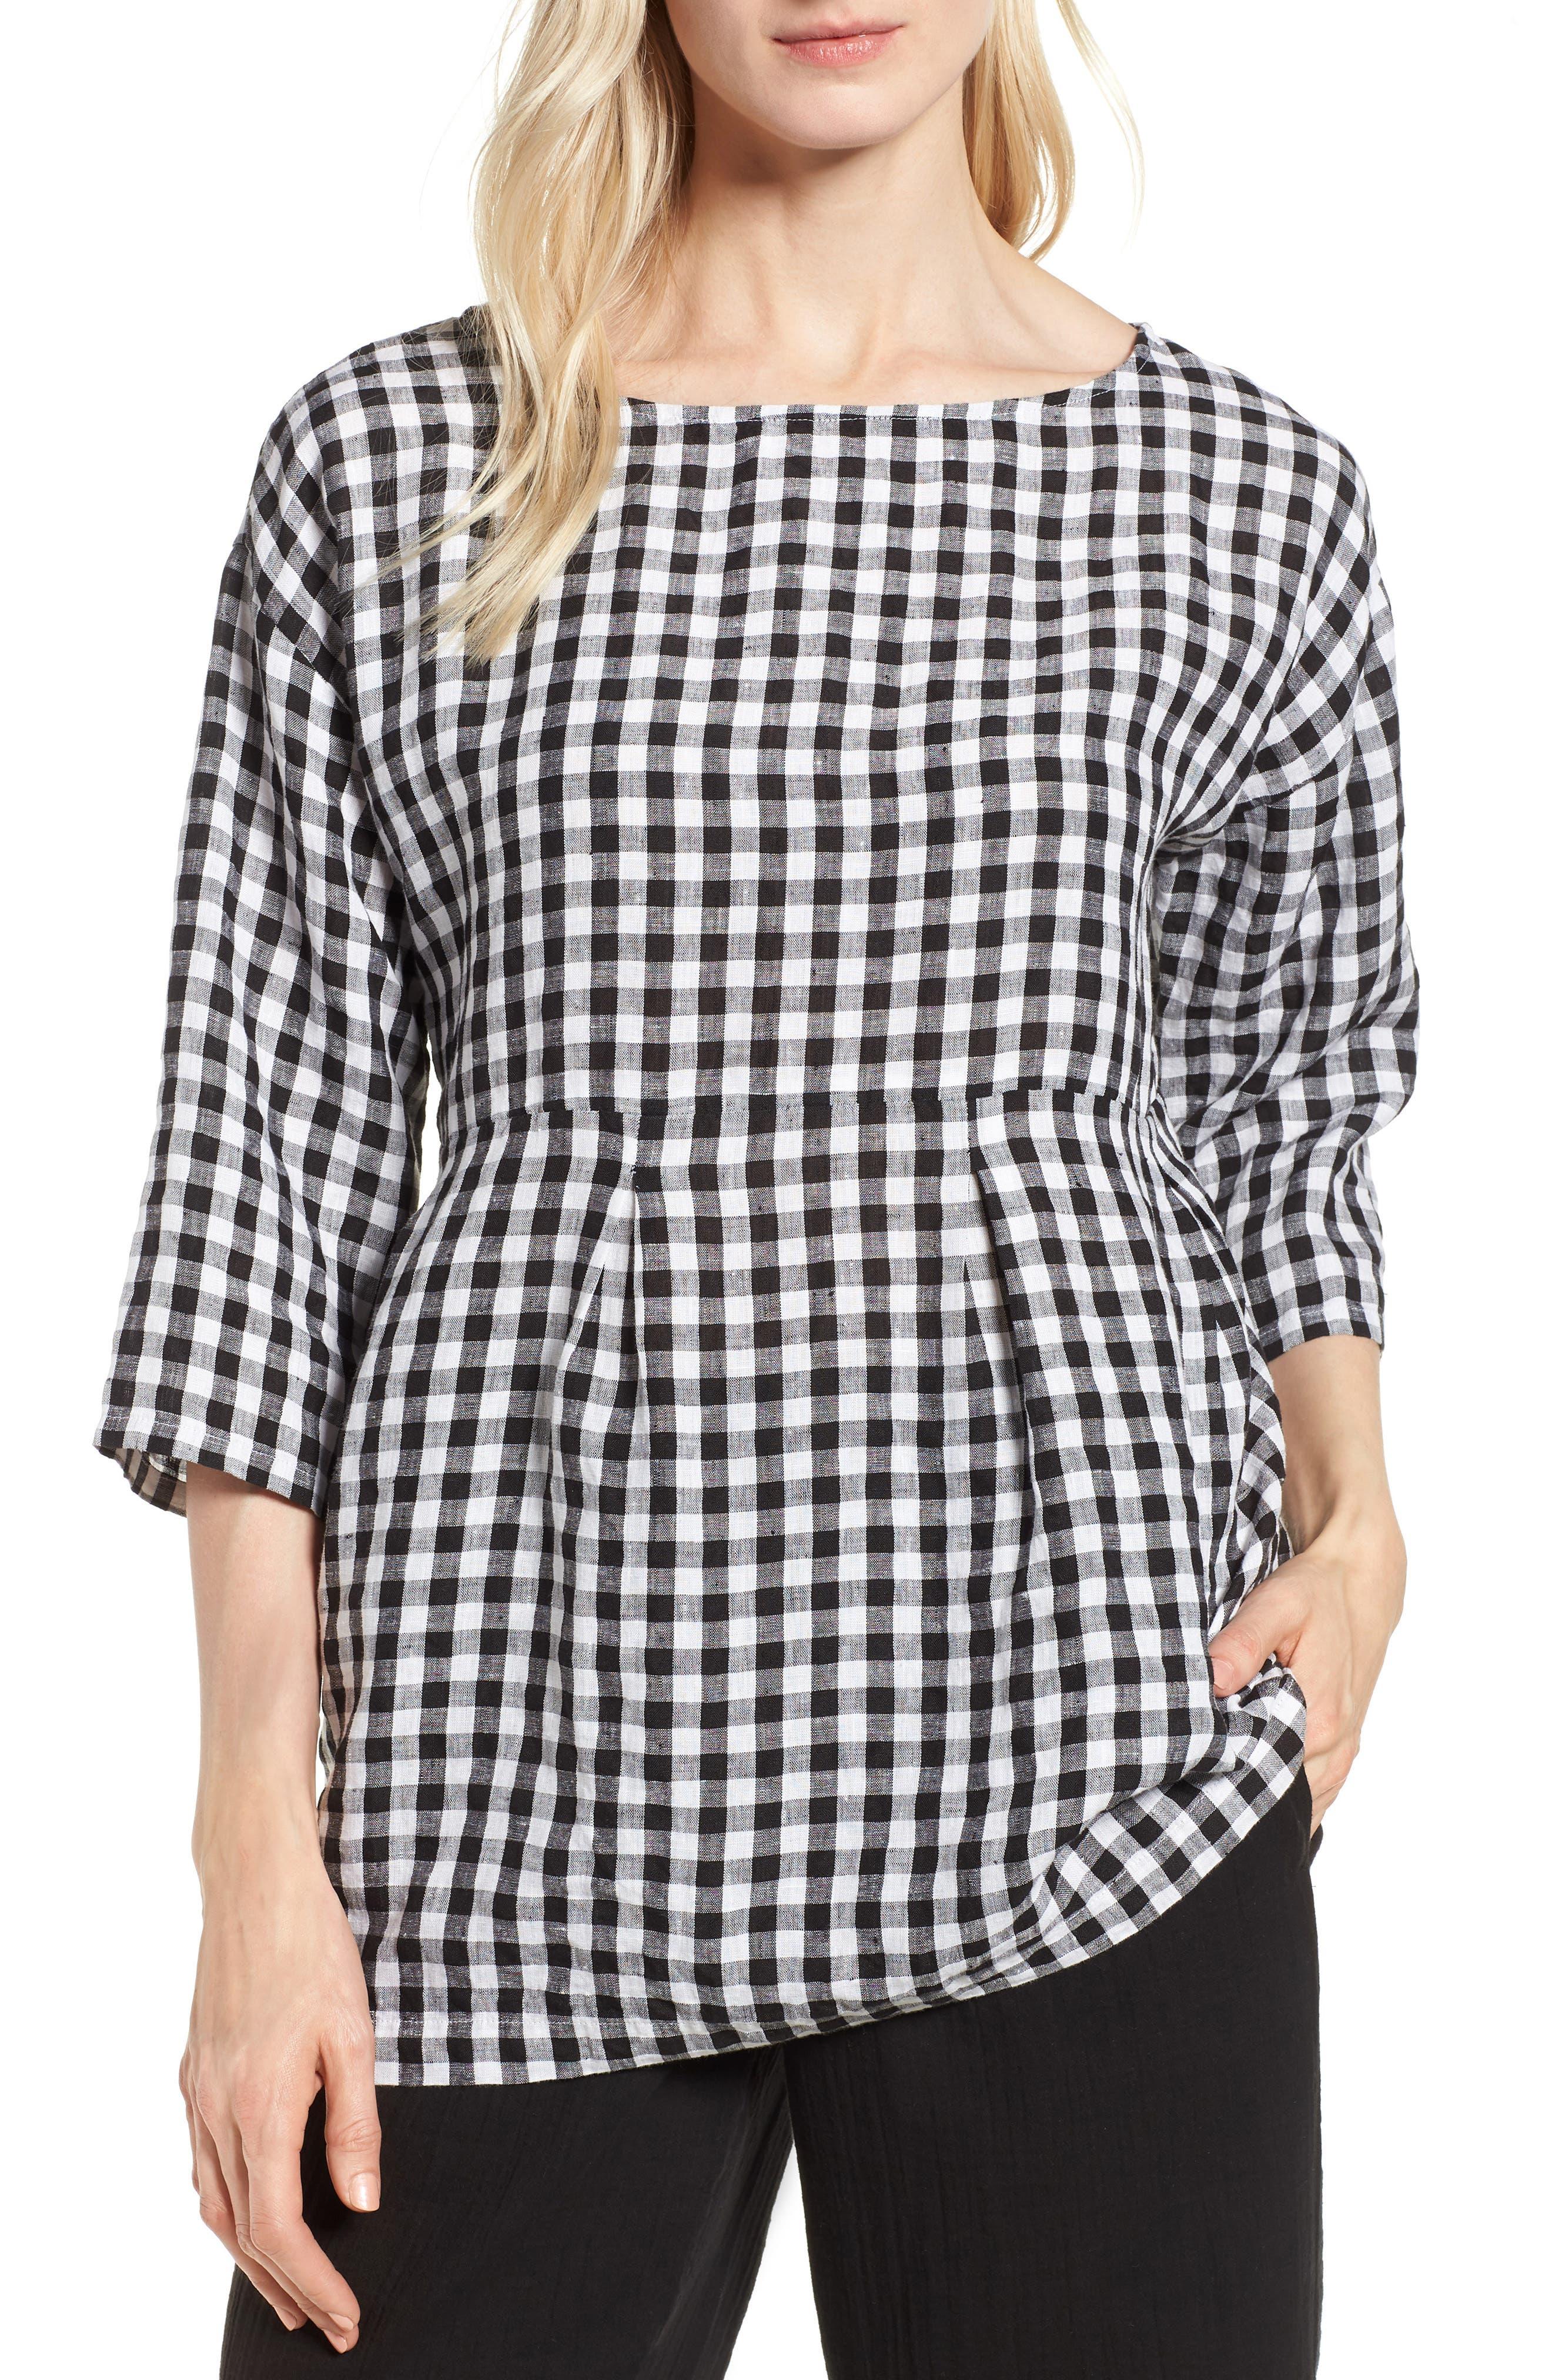 Gingham Organic Linen Top,                         Main,                         color, Black/ White